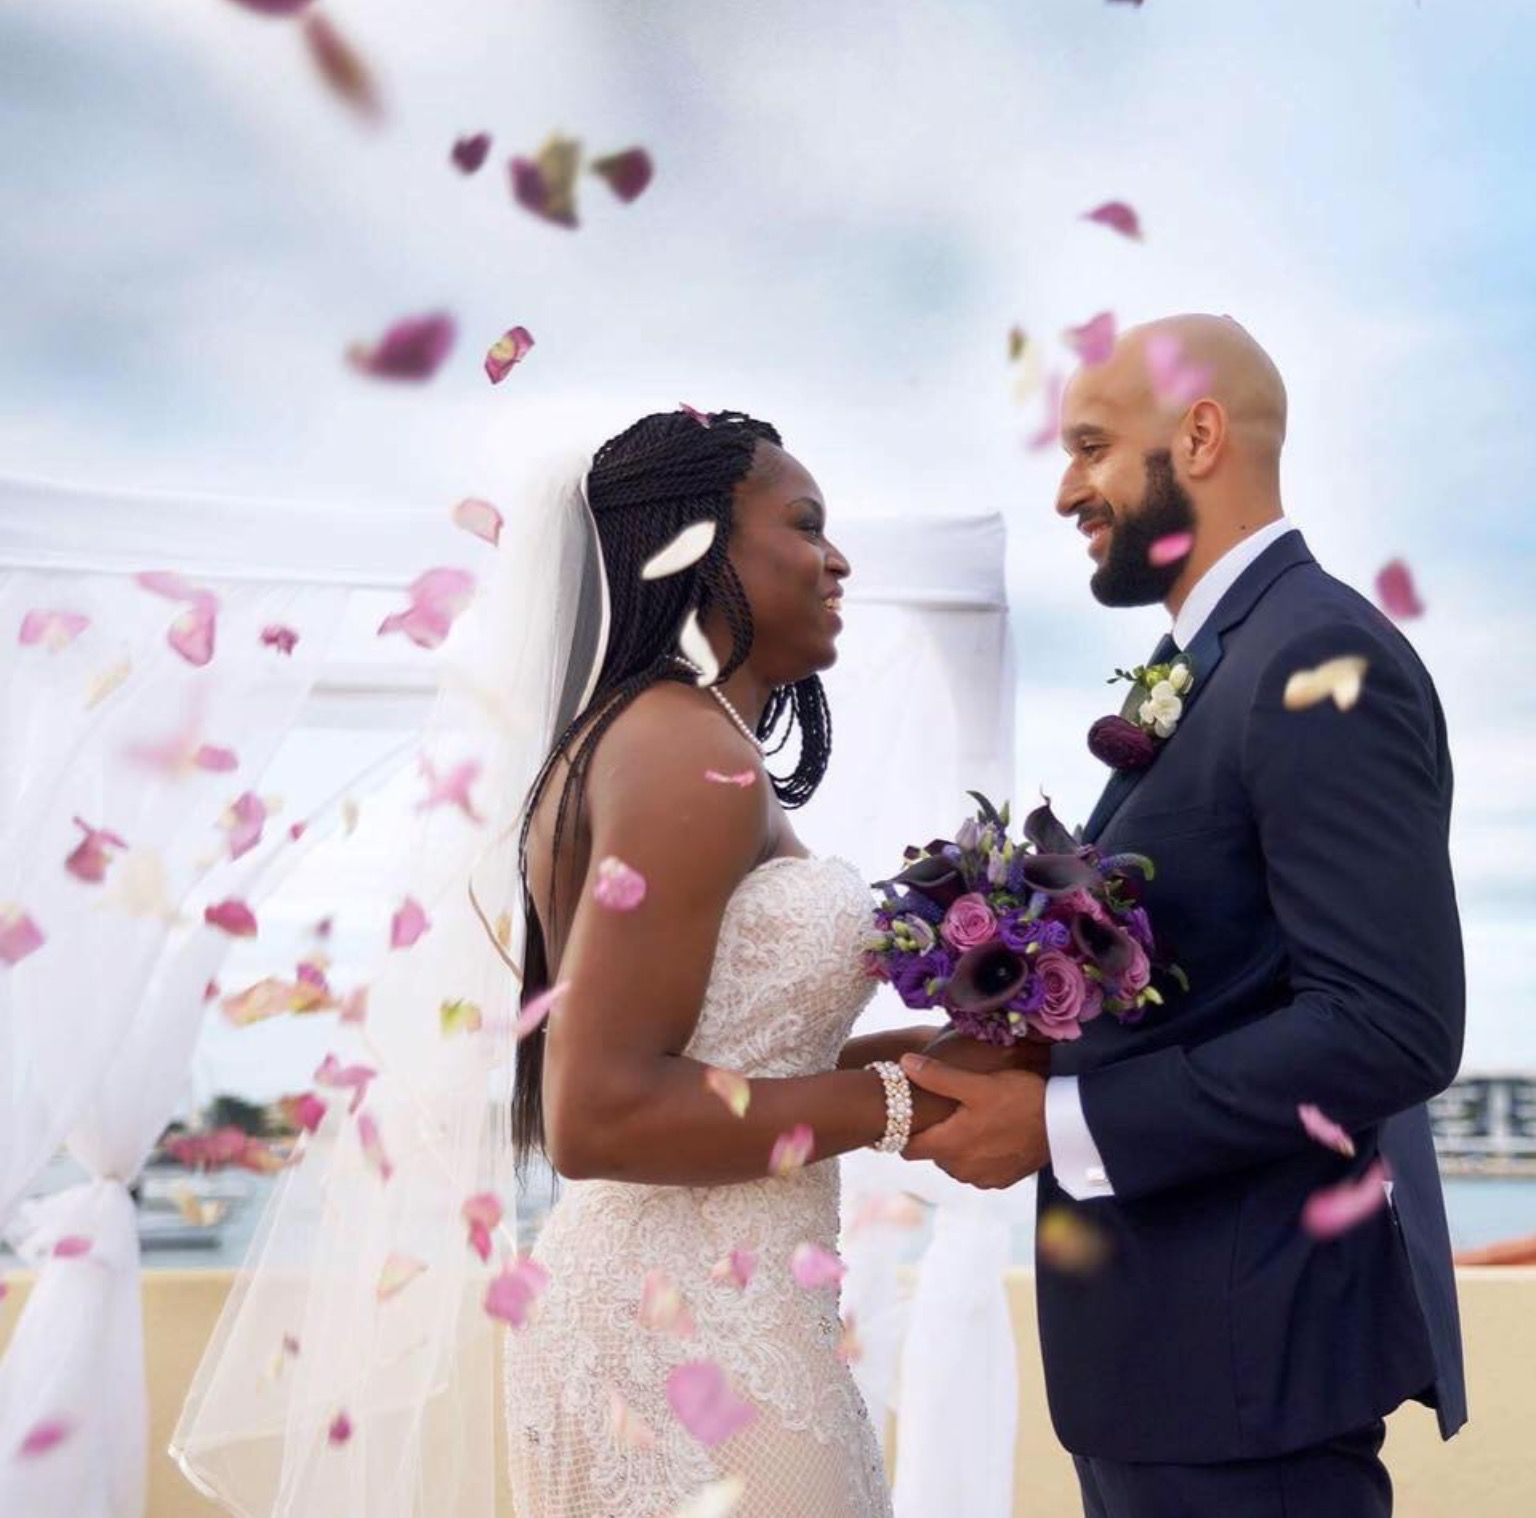 Karima Christmas & Austin Kelly. | WNBA Weddings | Pinterest | Wnba